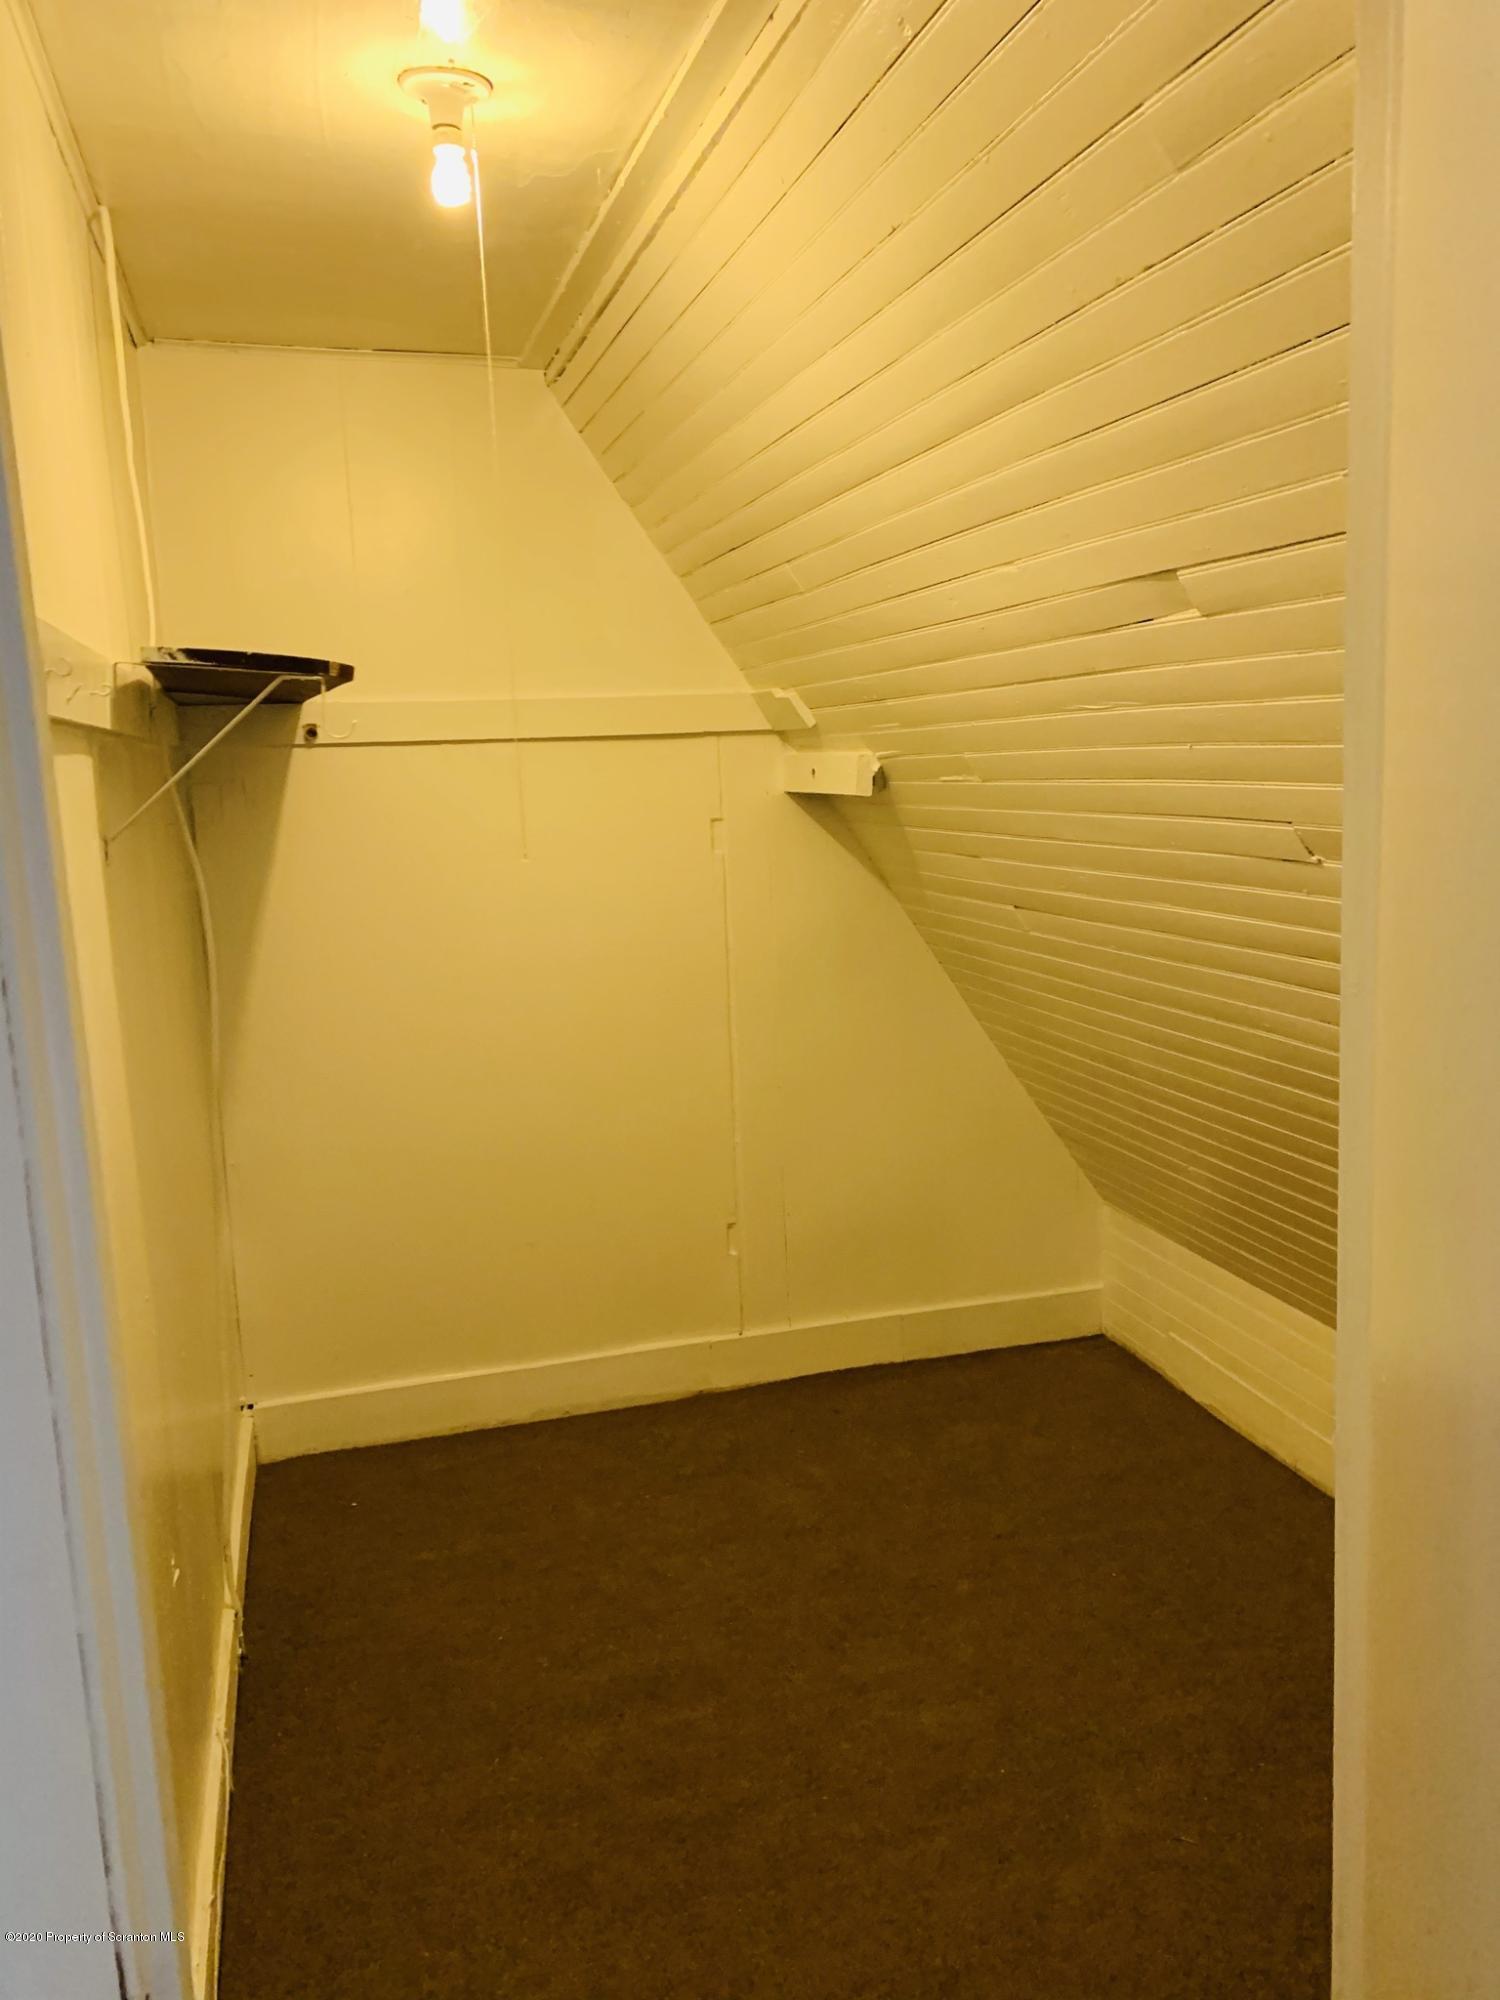 920 Webster Ave, Scranton, Pennsylvania 18505, 2 Bedrooms Bedrooms, 3 Rooms Rooms,1 BathroomBathrooms,Rental,For Lease,Webster,20-4996